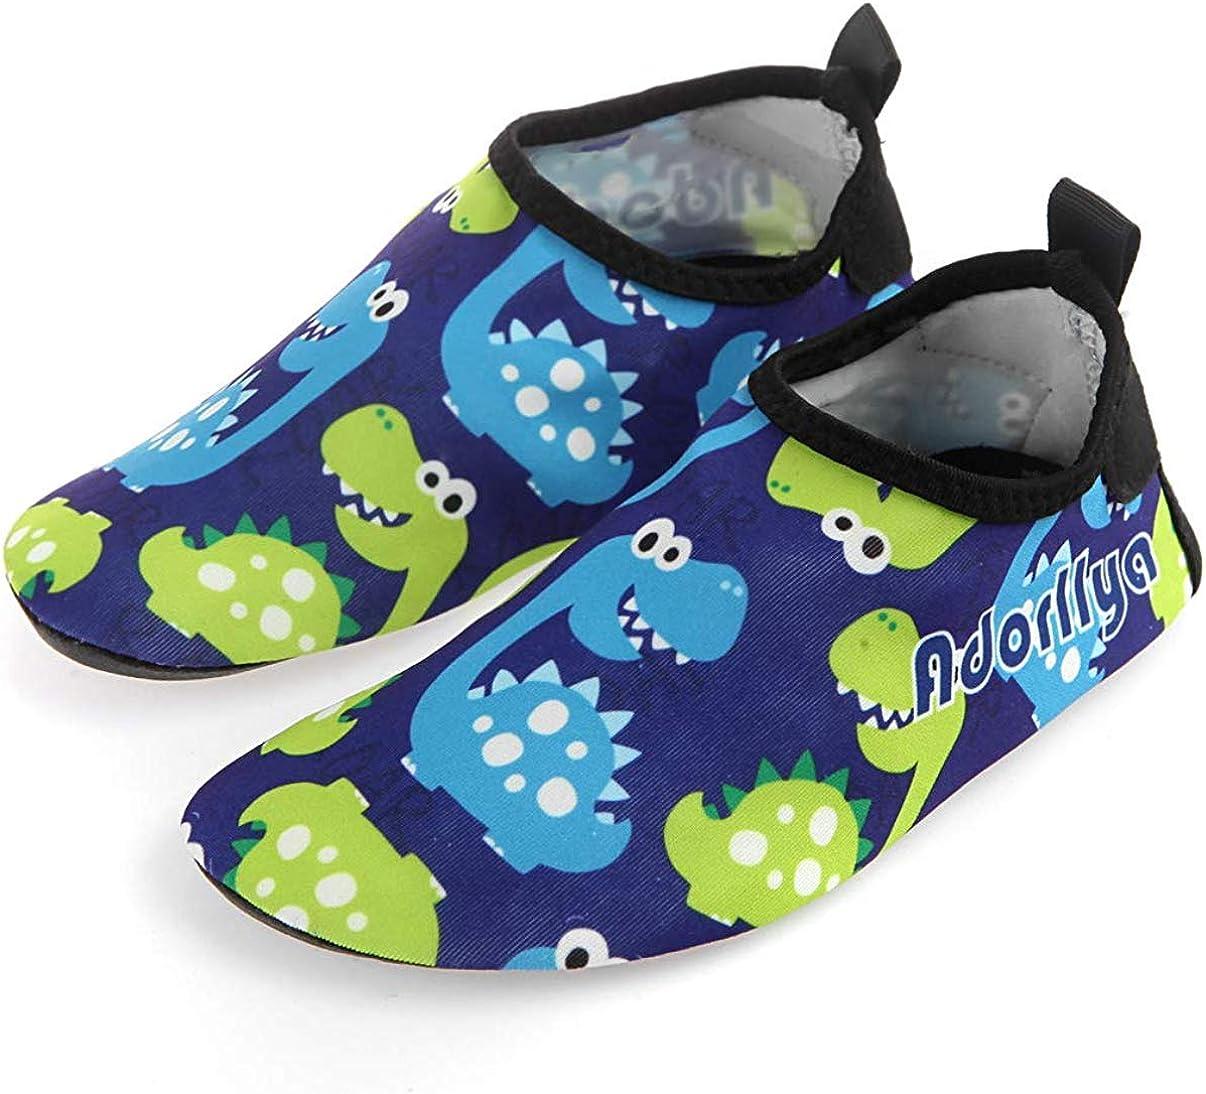 Adorllya Toddler Baby Water Shoes Barefoot Aqua Socks Swim Shoes for Kids Boys Girls Beach Pool